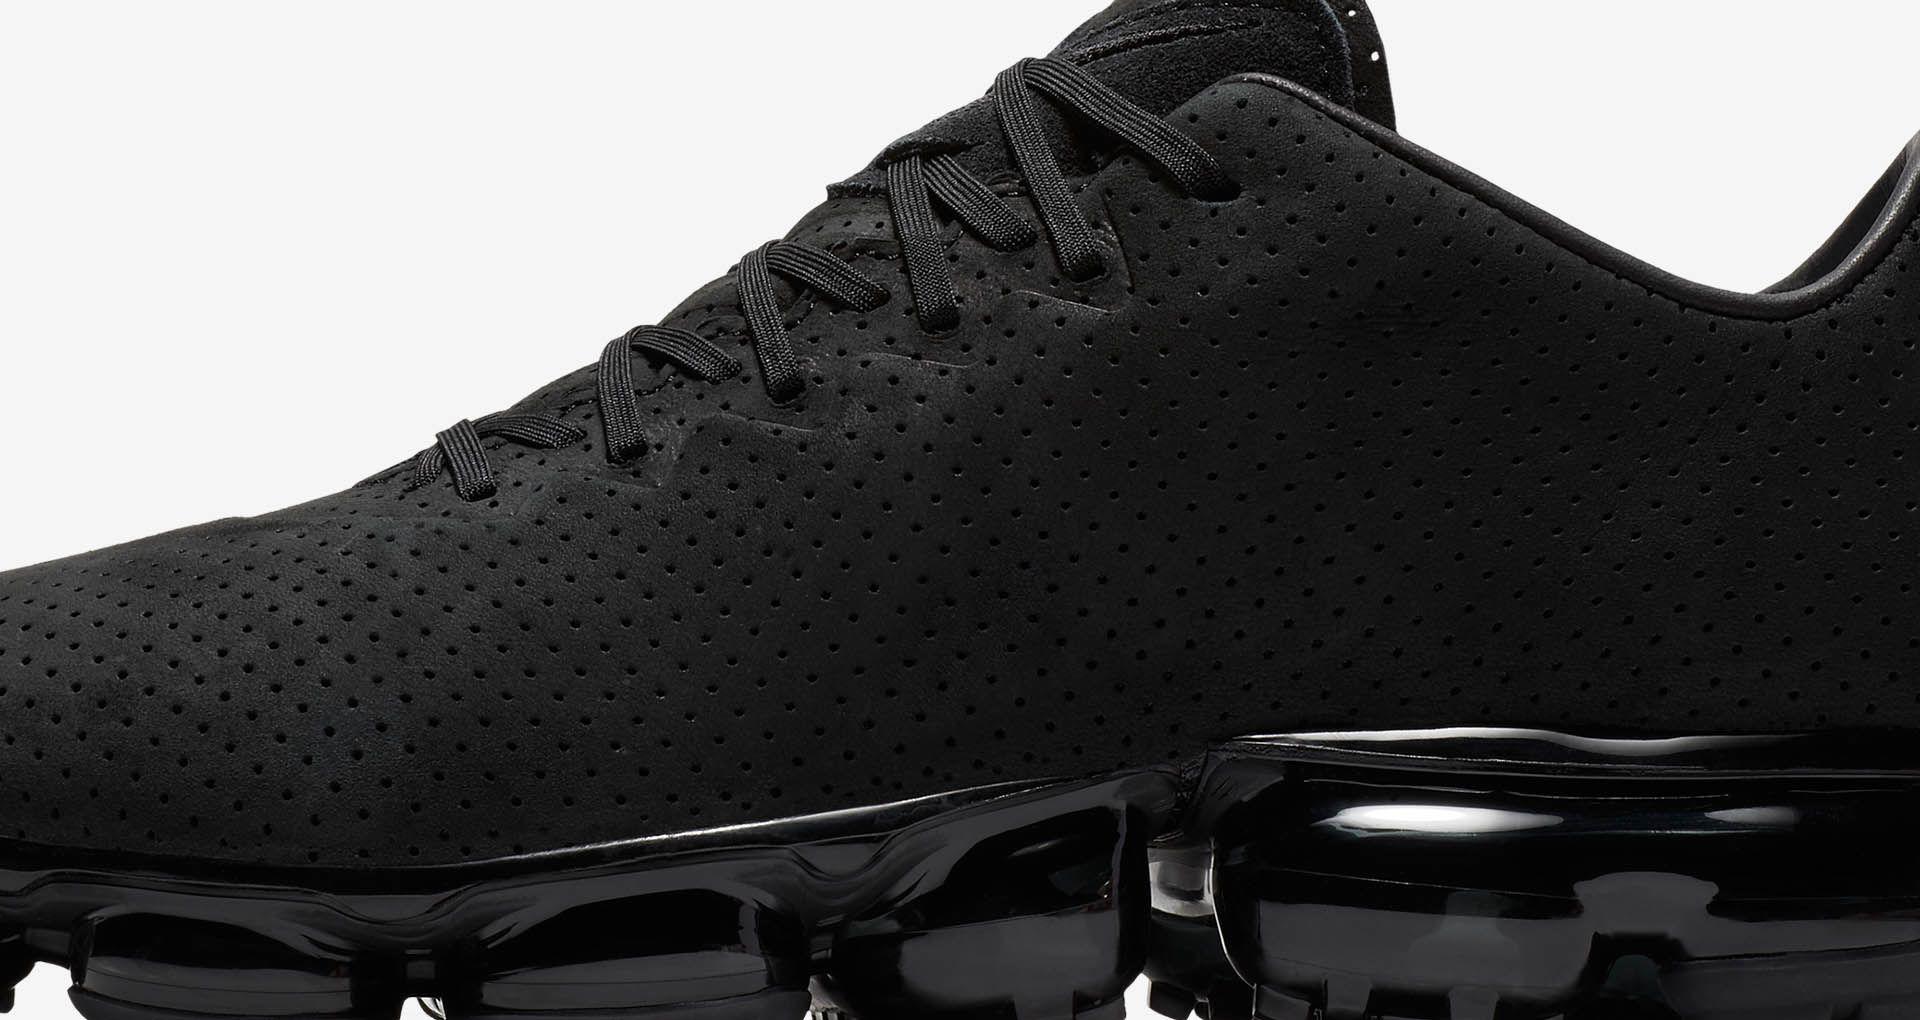 newest 5e76e 8adca Nike Air VaporMax LTR  Triple Black  Release Date